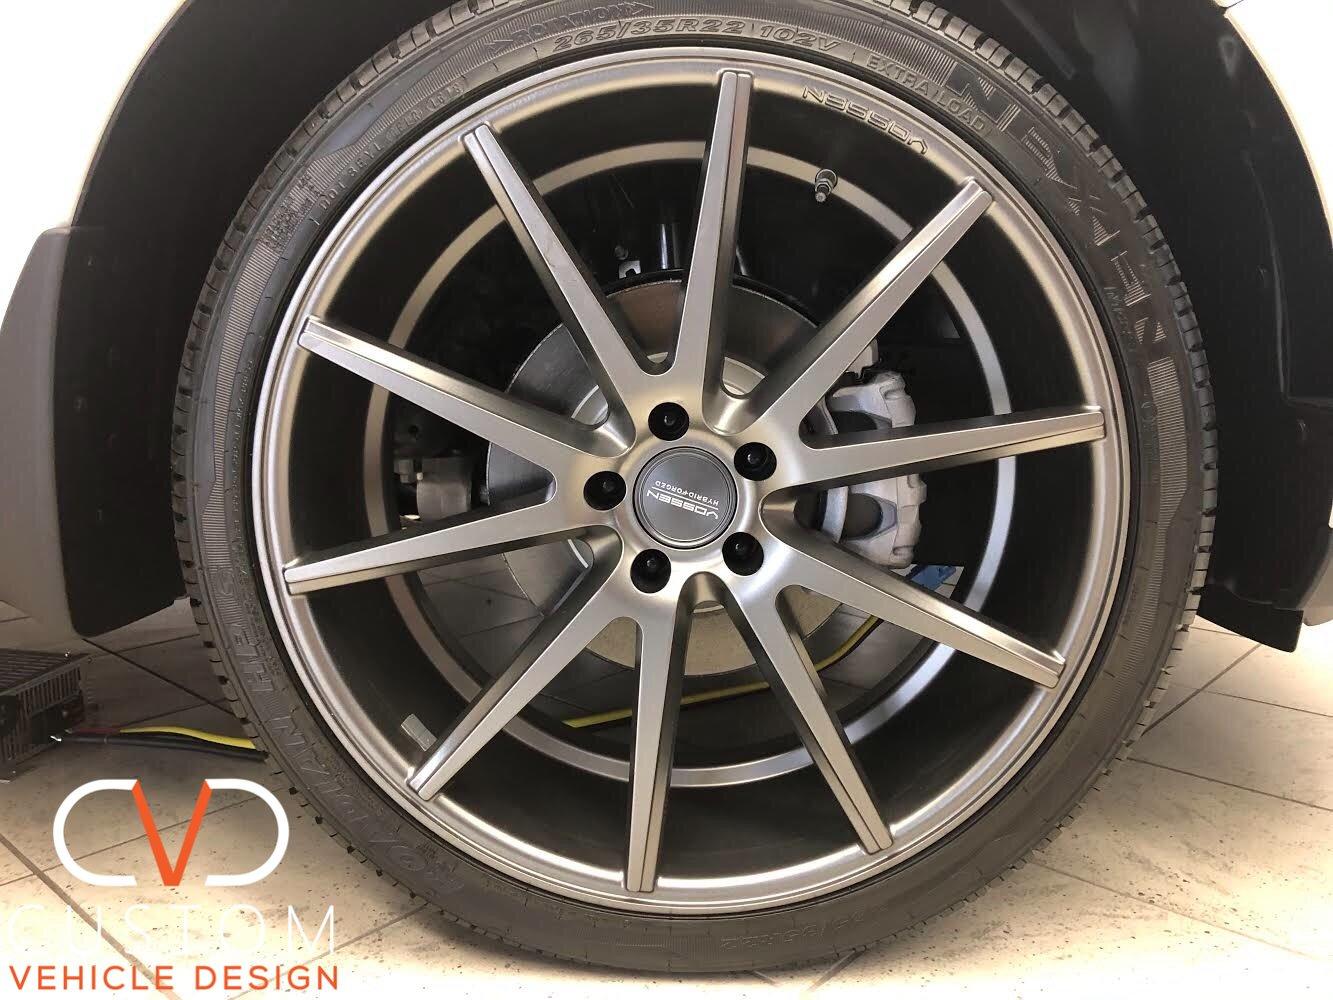 Custom Vehicle Designs On Twitter 2019 Acura Rdx On 22 Inch Vossen Wheels 2019 Acura Rdx Acurardx 22inch Vossenwheels Cvd Cvdauto Customvehicledesign Https T Co R2abcbc47o